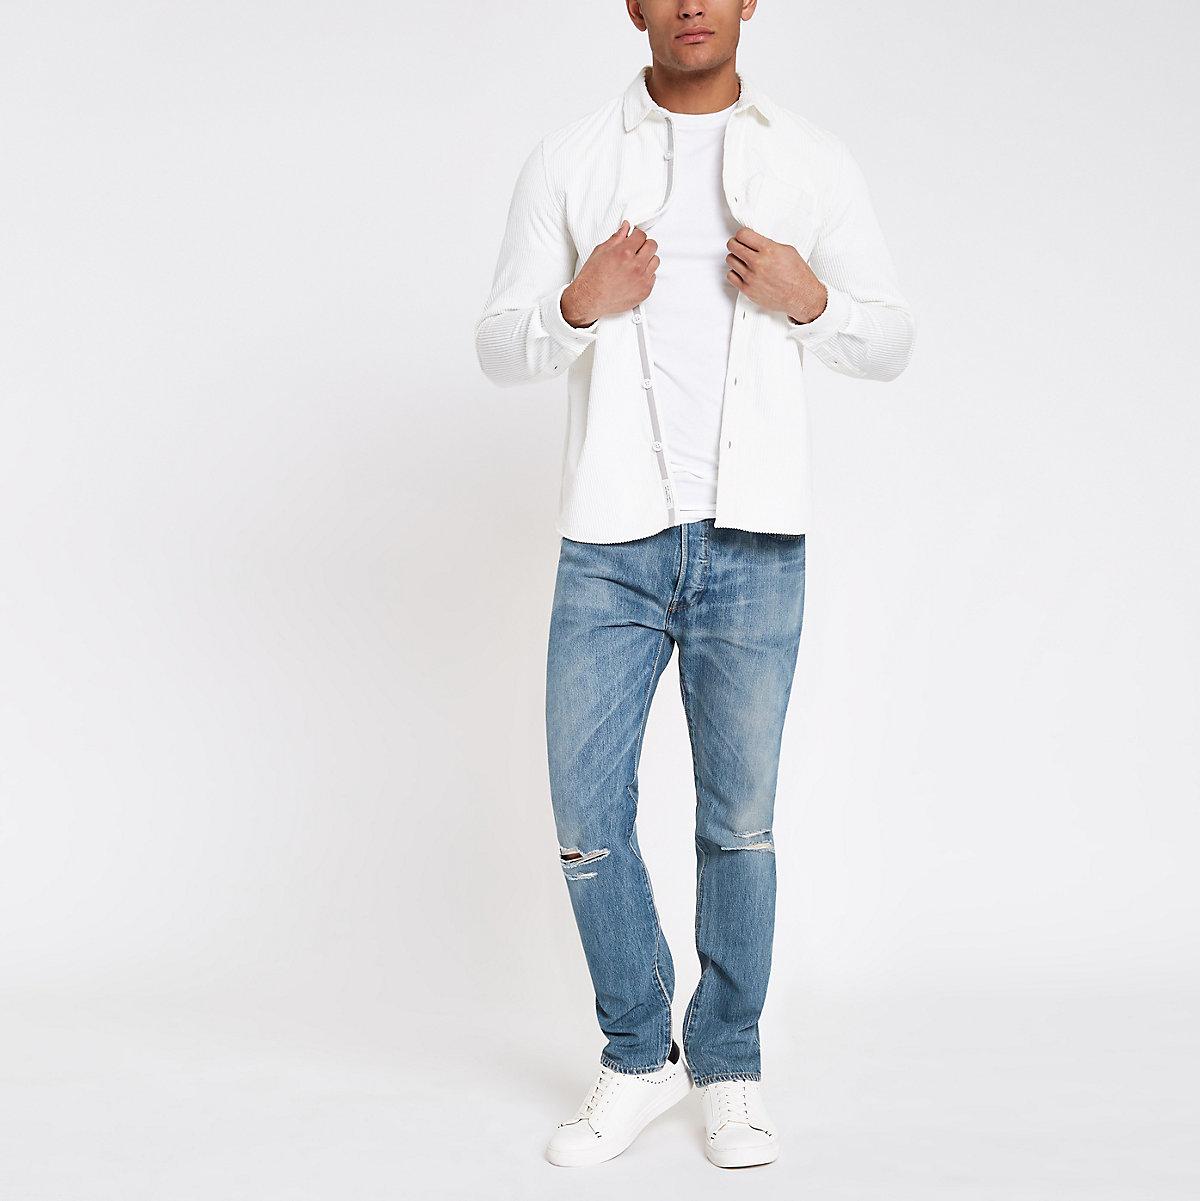 Levi's 501 light blue ripped skinny jeans